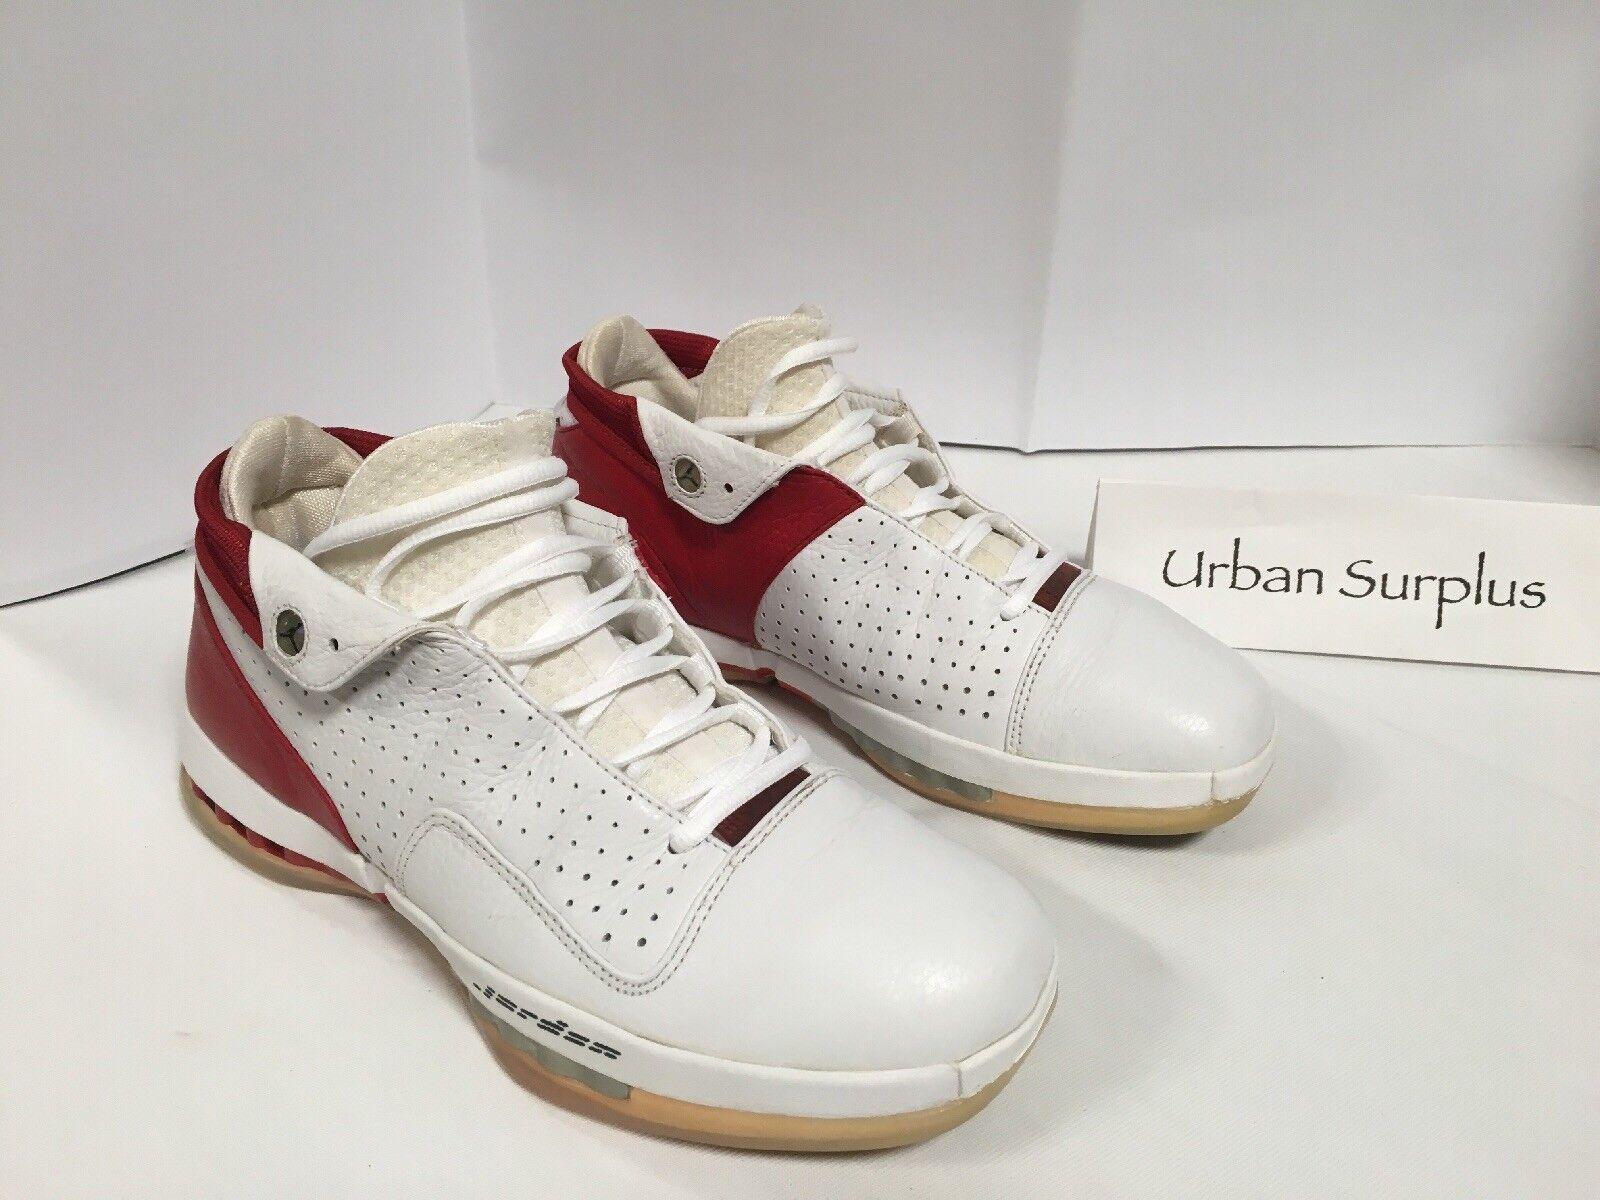 2001 Nike Air 136069-101-00 Jordan  Low Men's Red/White 136069-101-00 Air (Size 11) 21d611